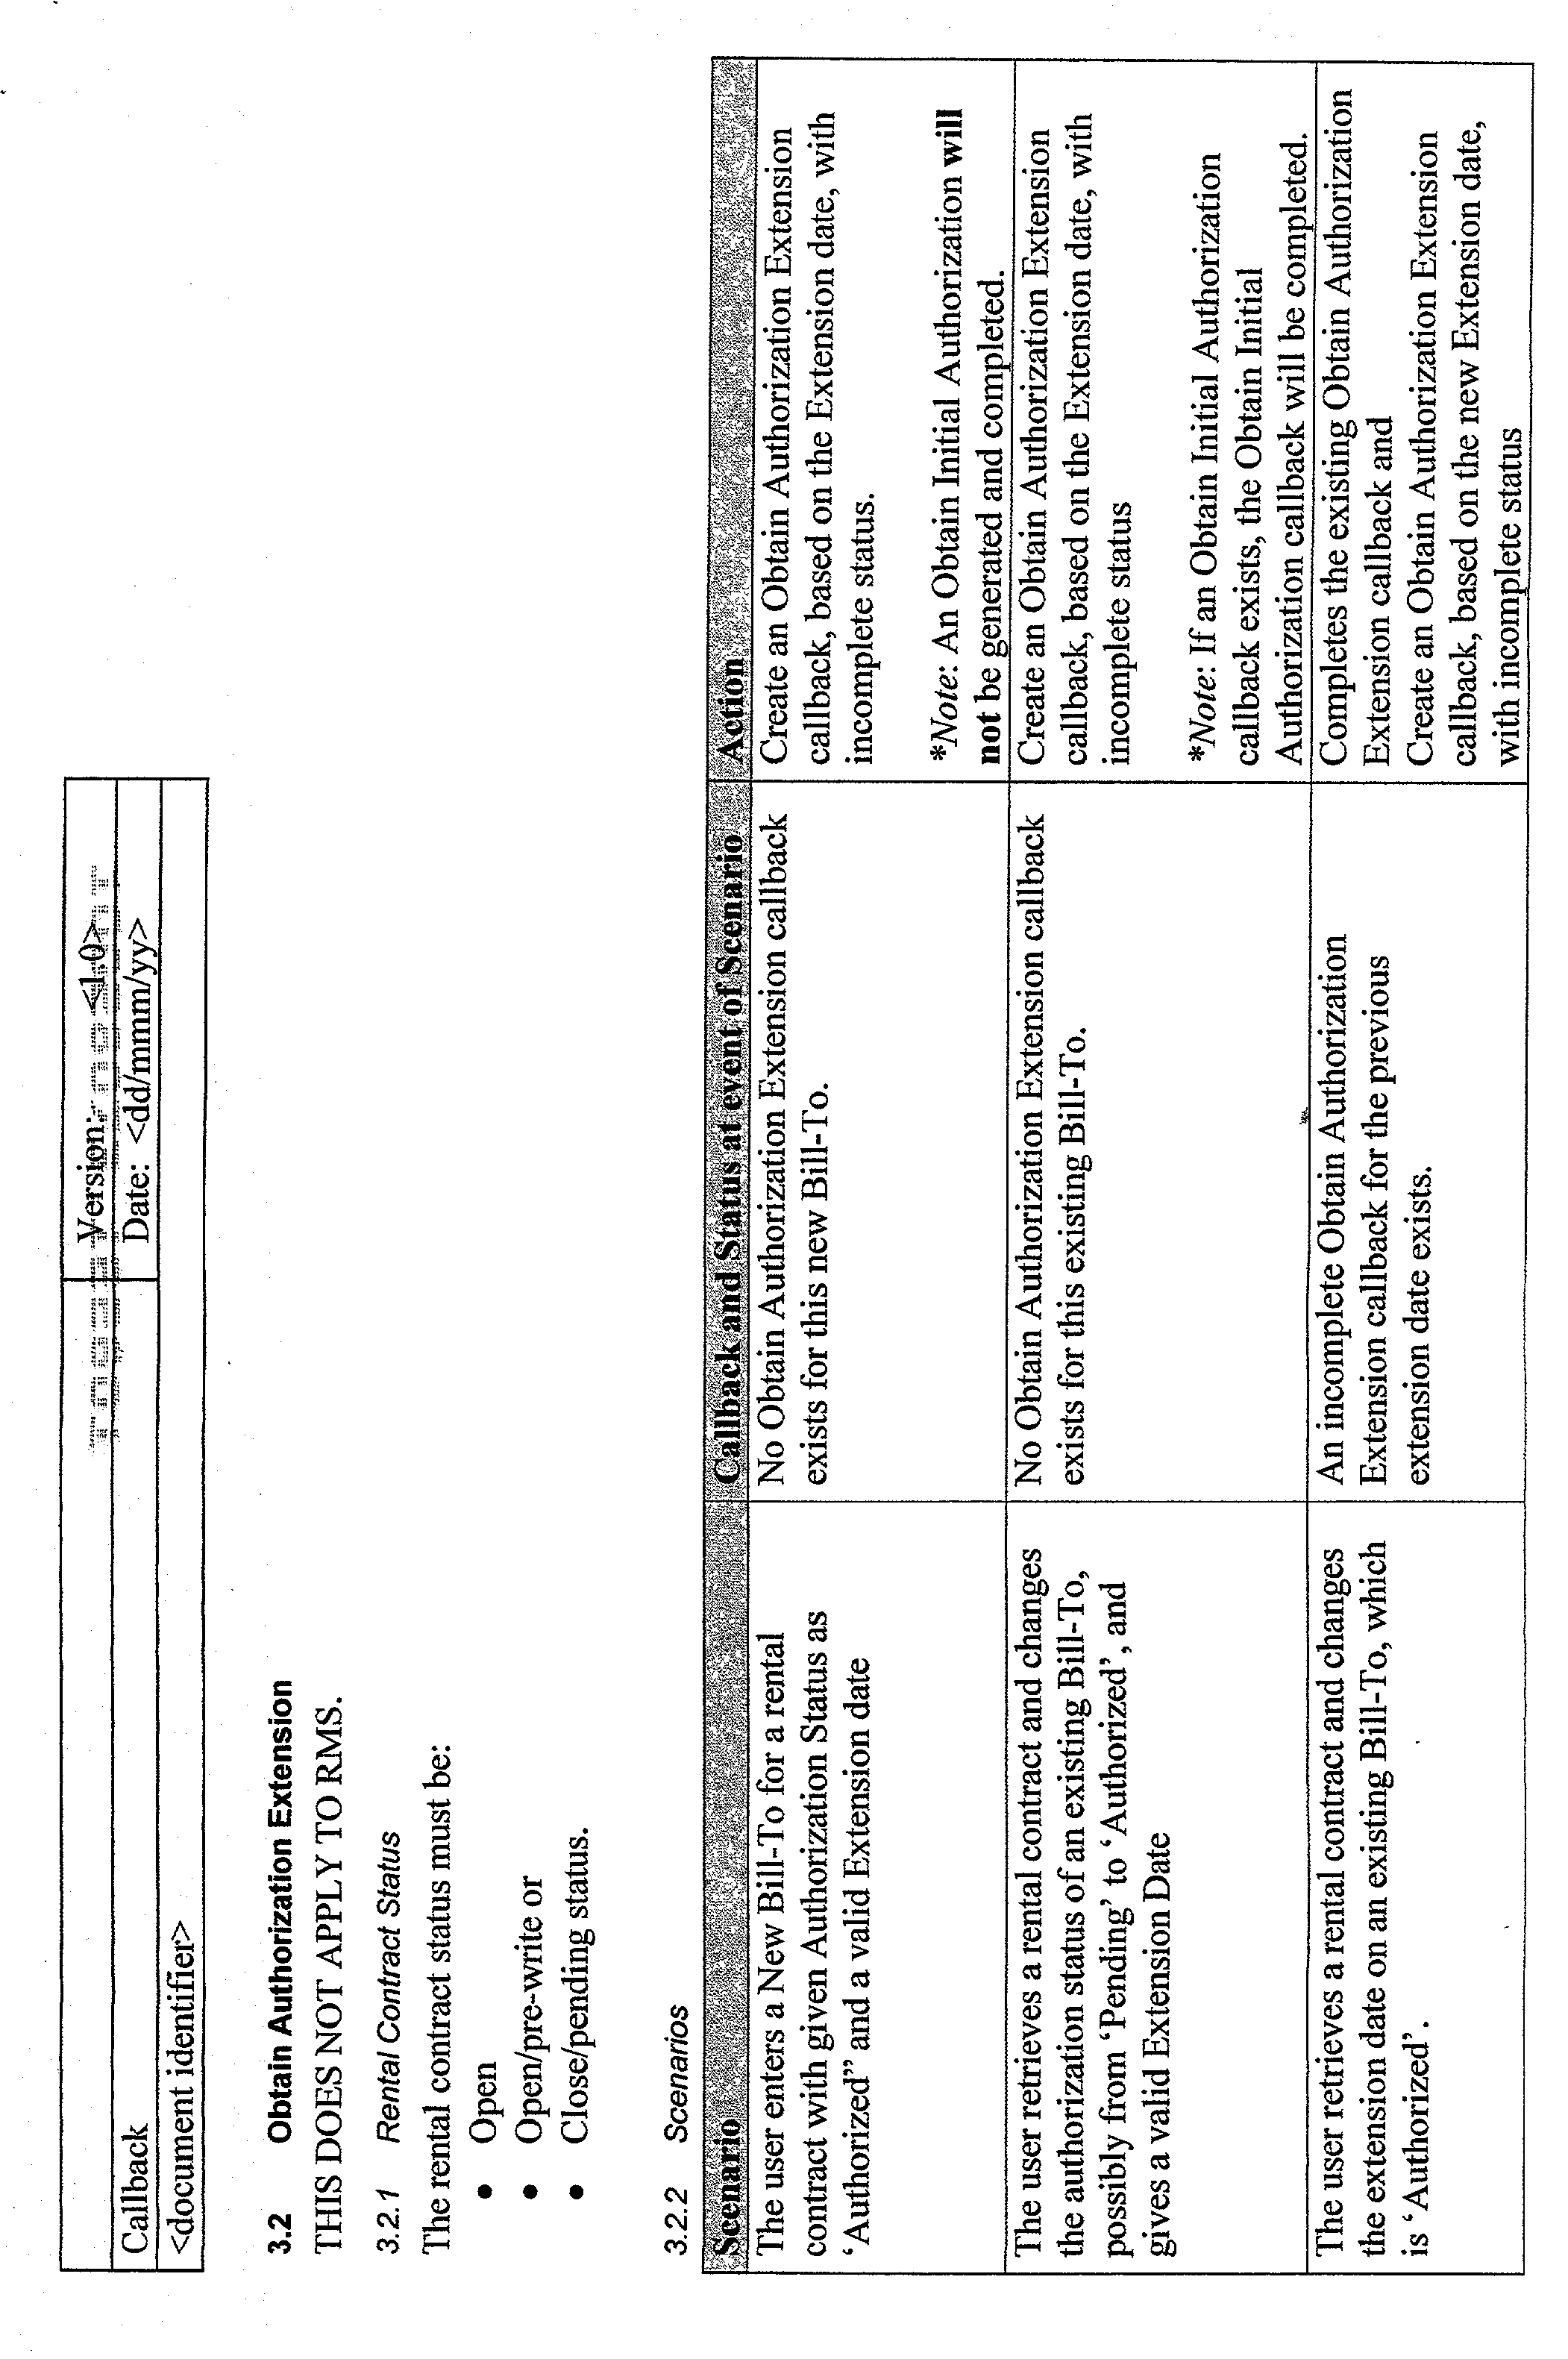 Figure US20030125992A1-20030703-P01439